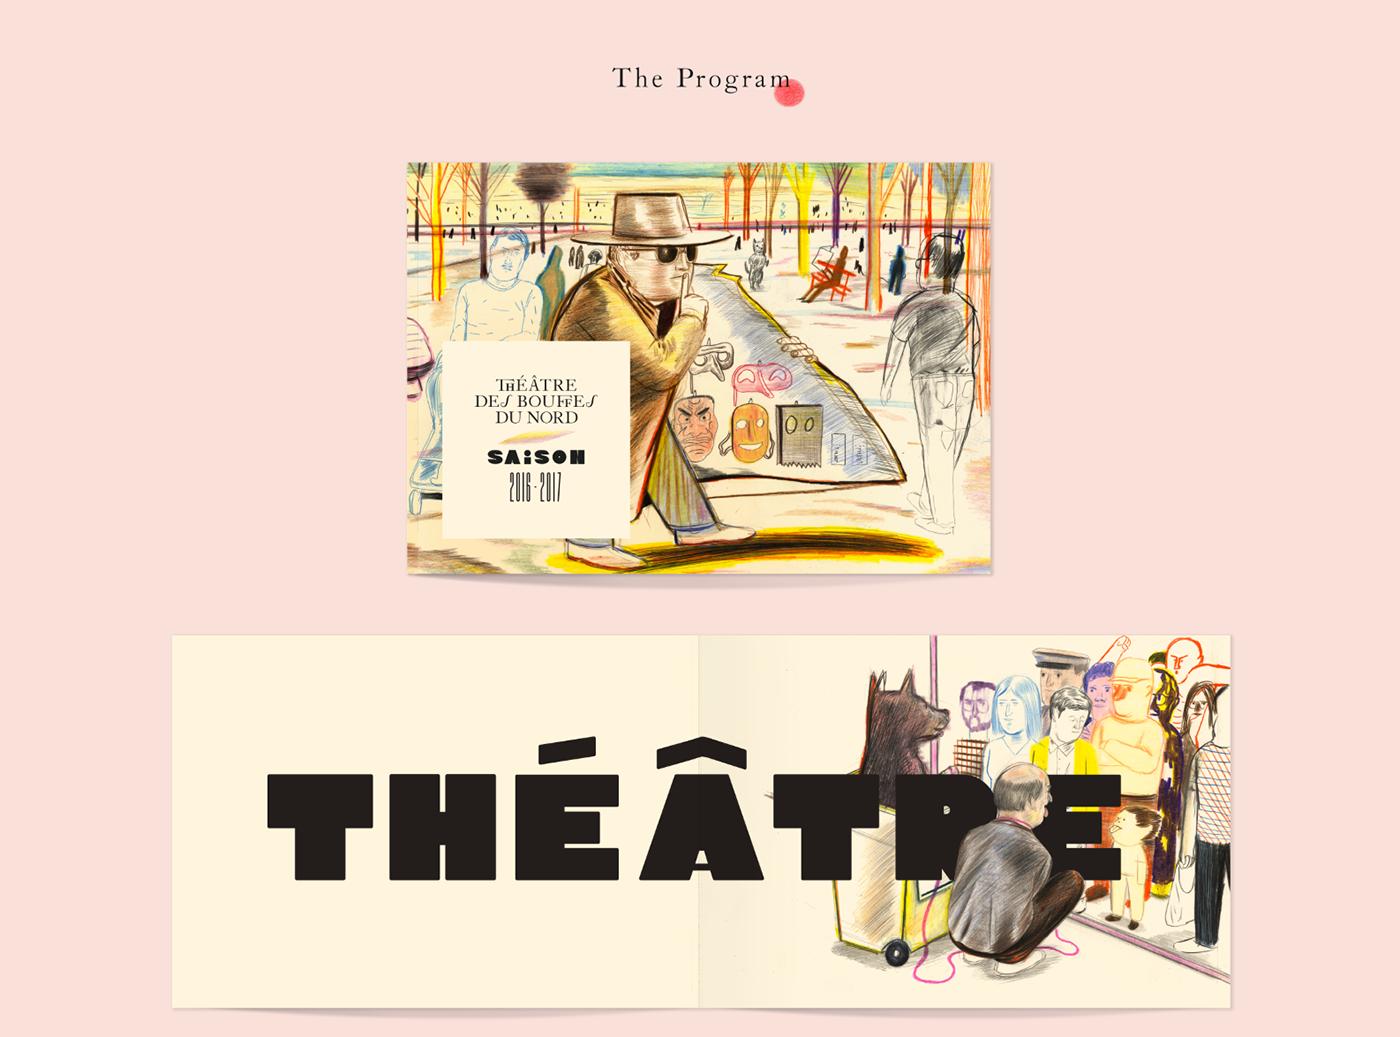 Violaine&jeremy ILLUSTRATION  yann kebbi typography   type typedesign font bouffes Bouffes du Nord Theatre